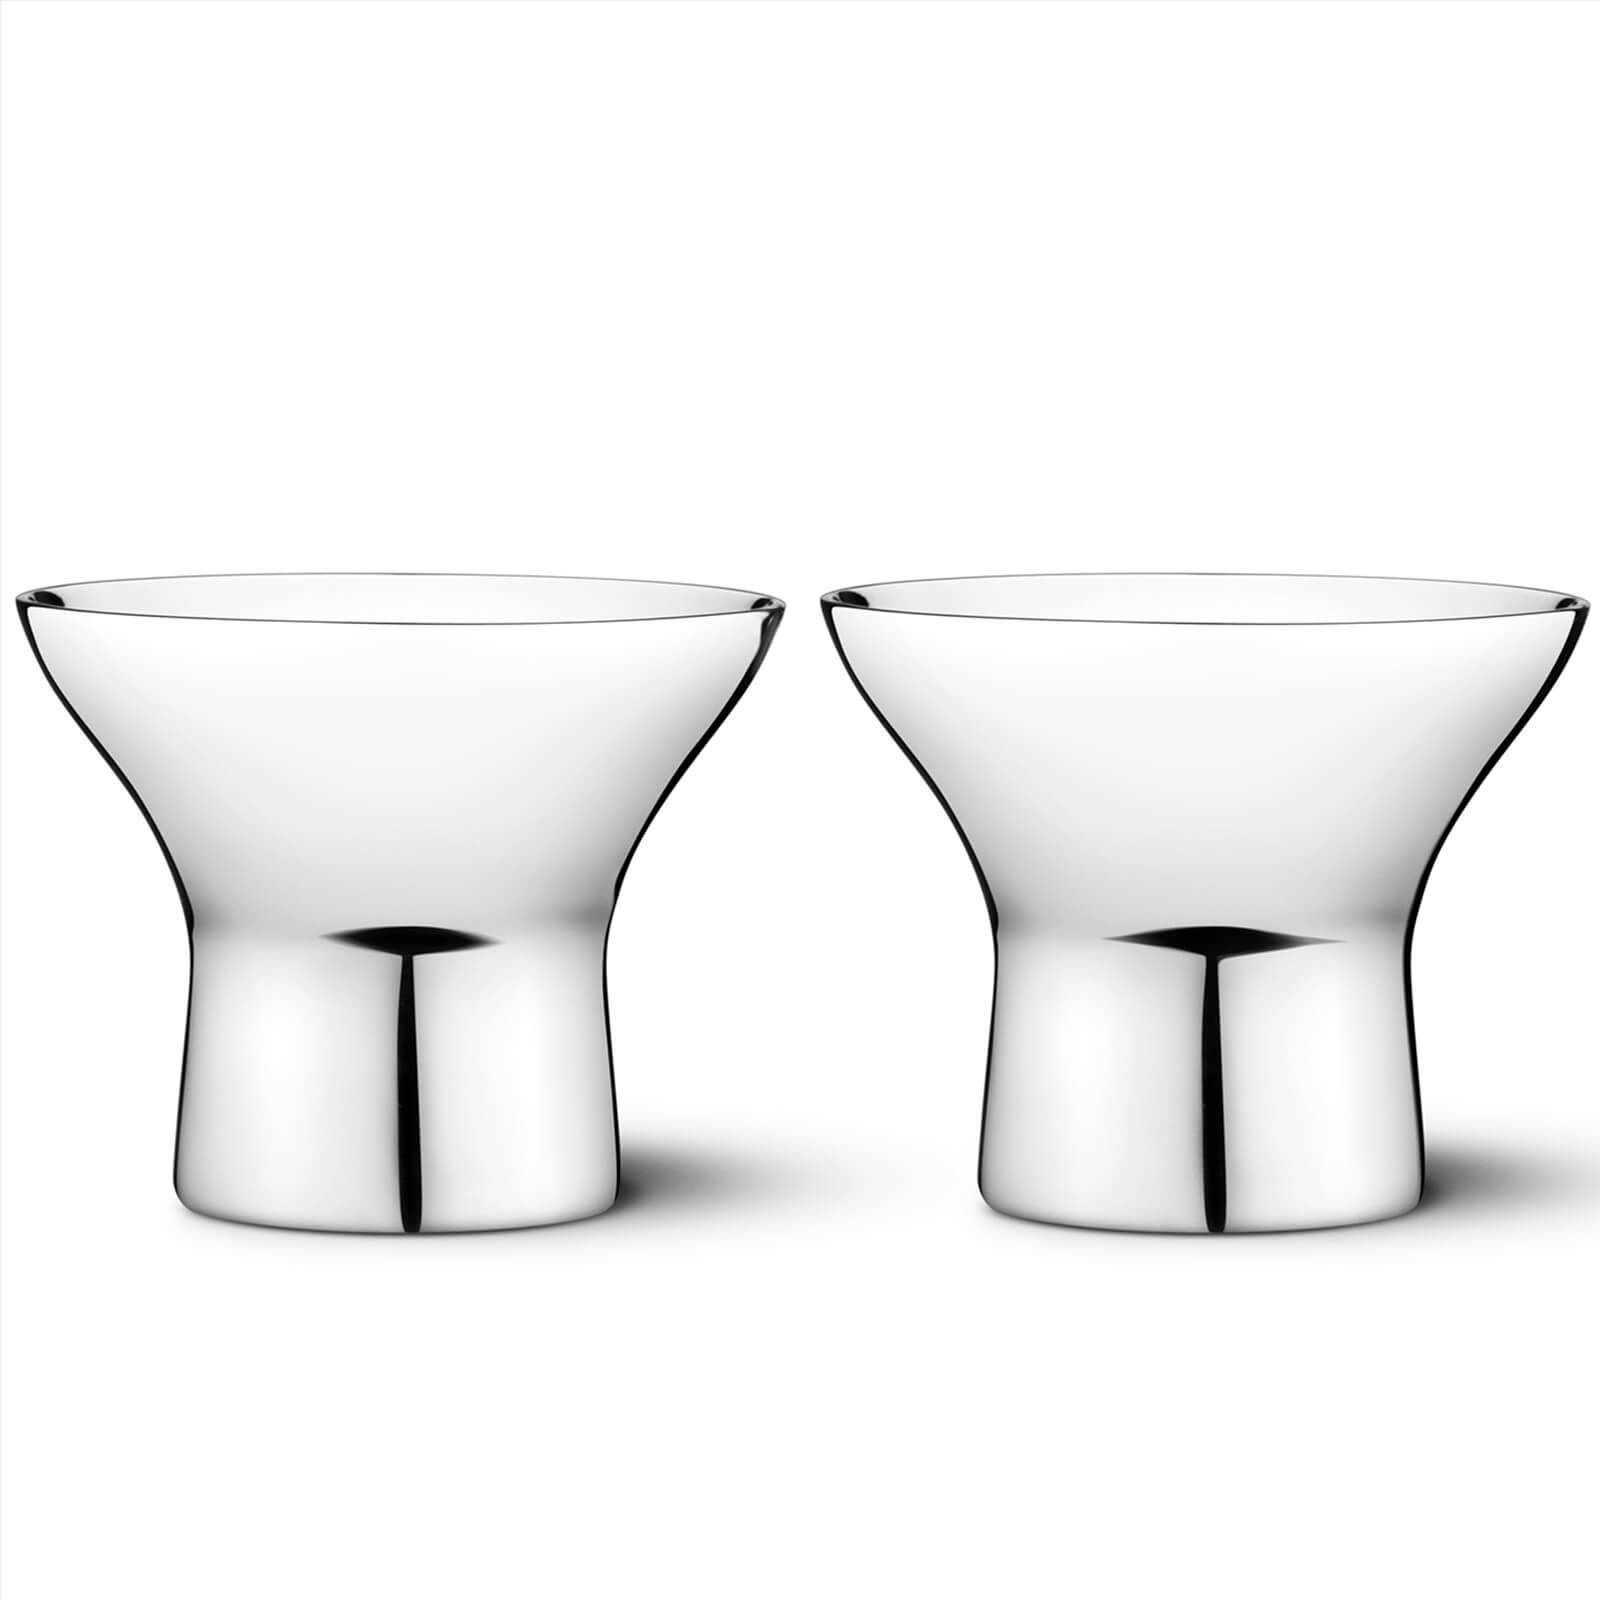 Jensen Georg Jensen Alfredoredo Egg Cups - Set of 2